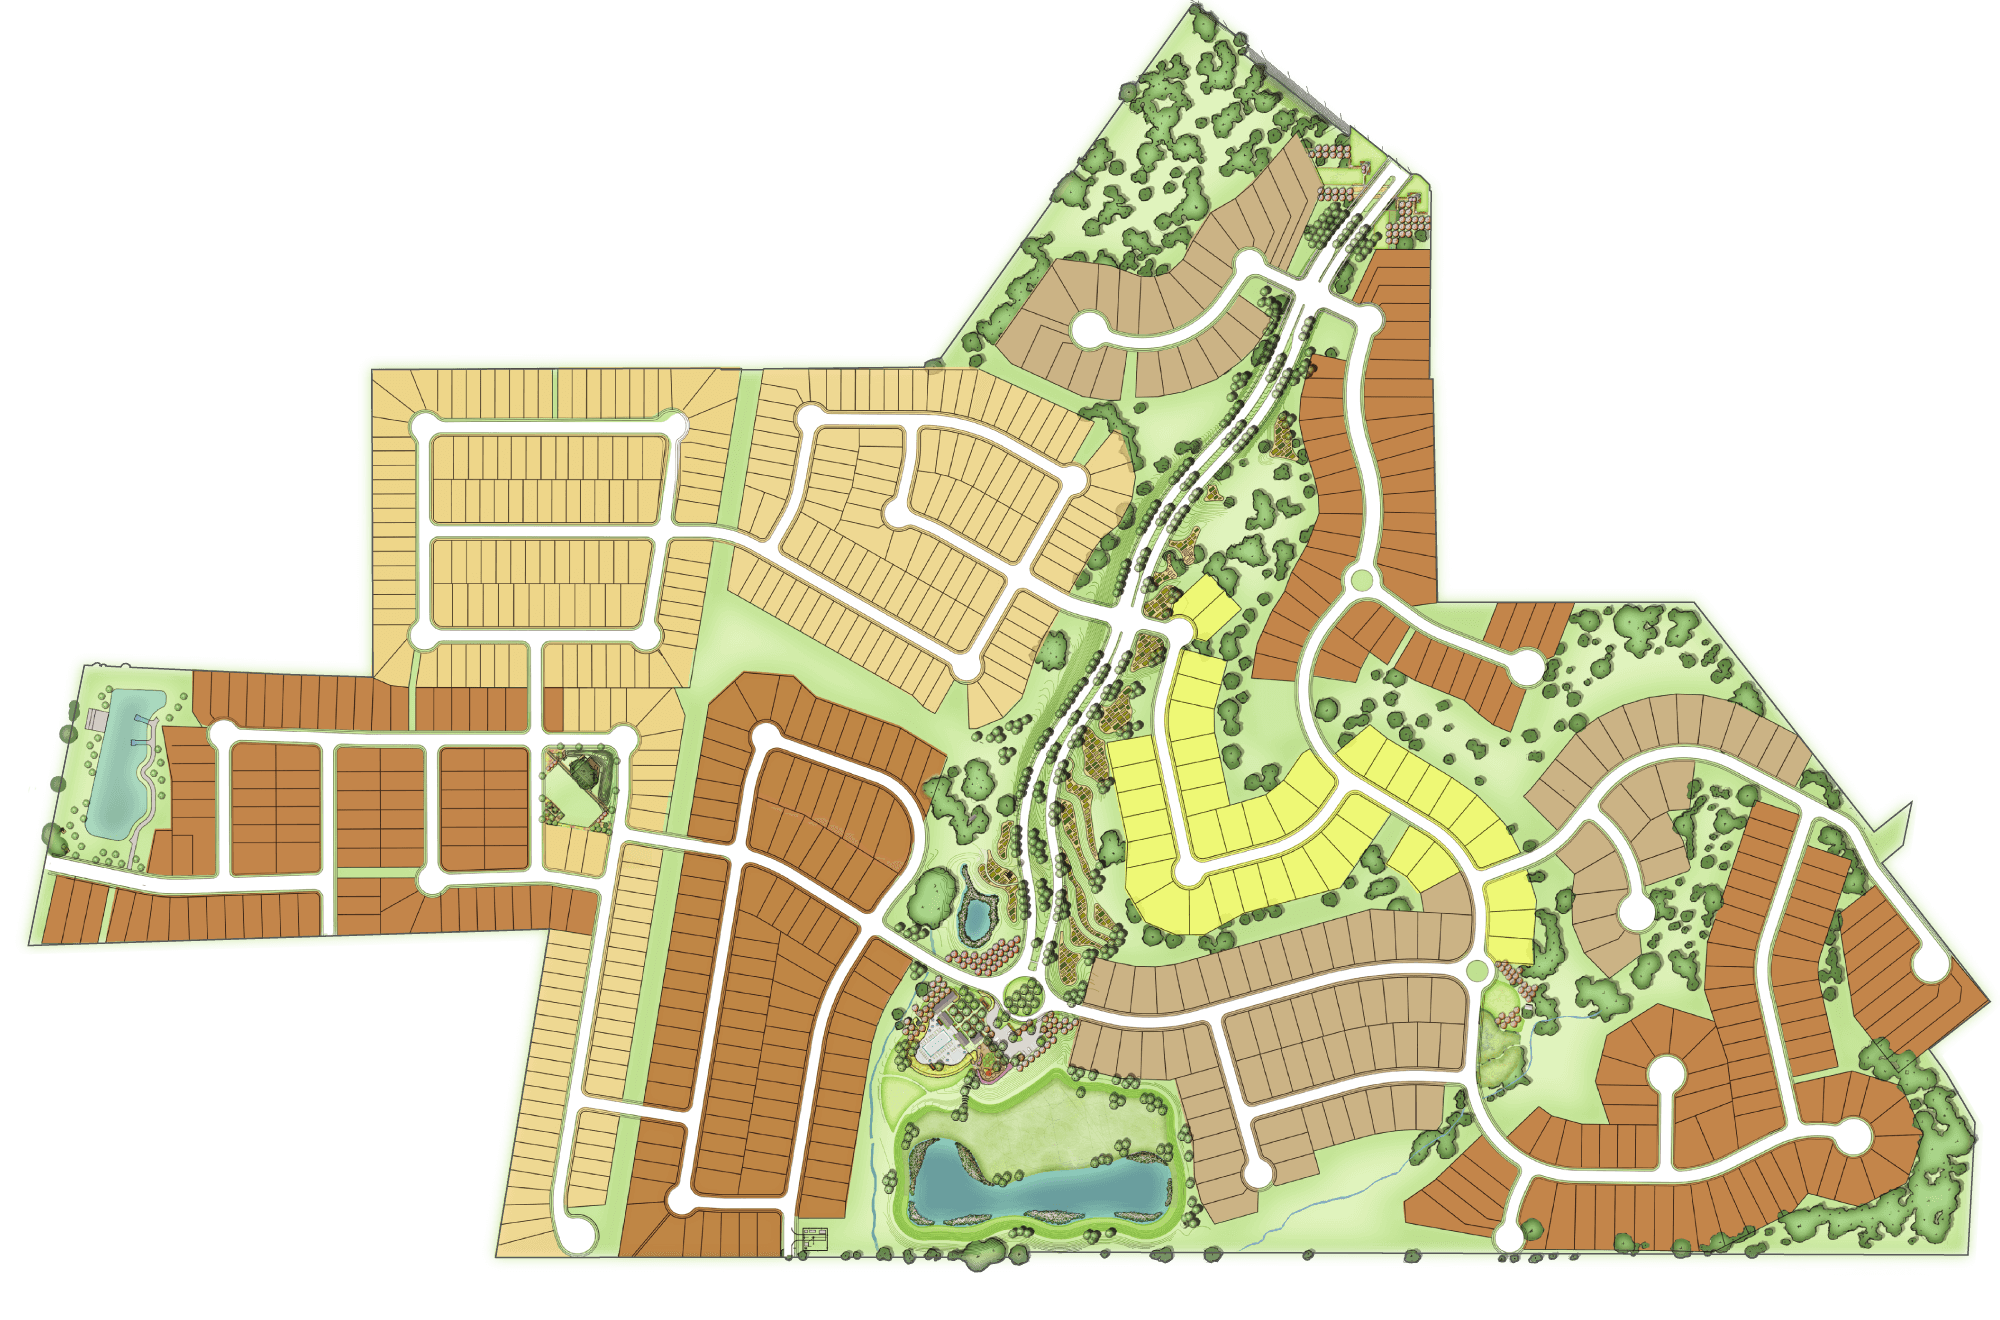 Orchard Ridge site plan